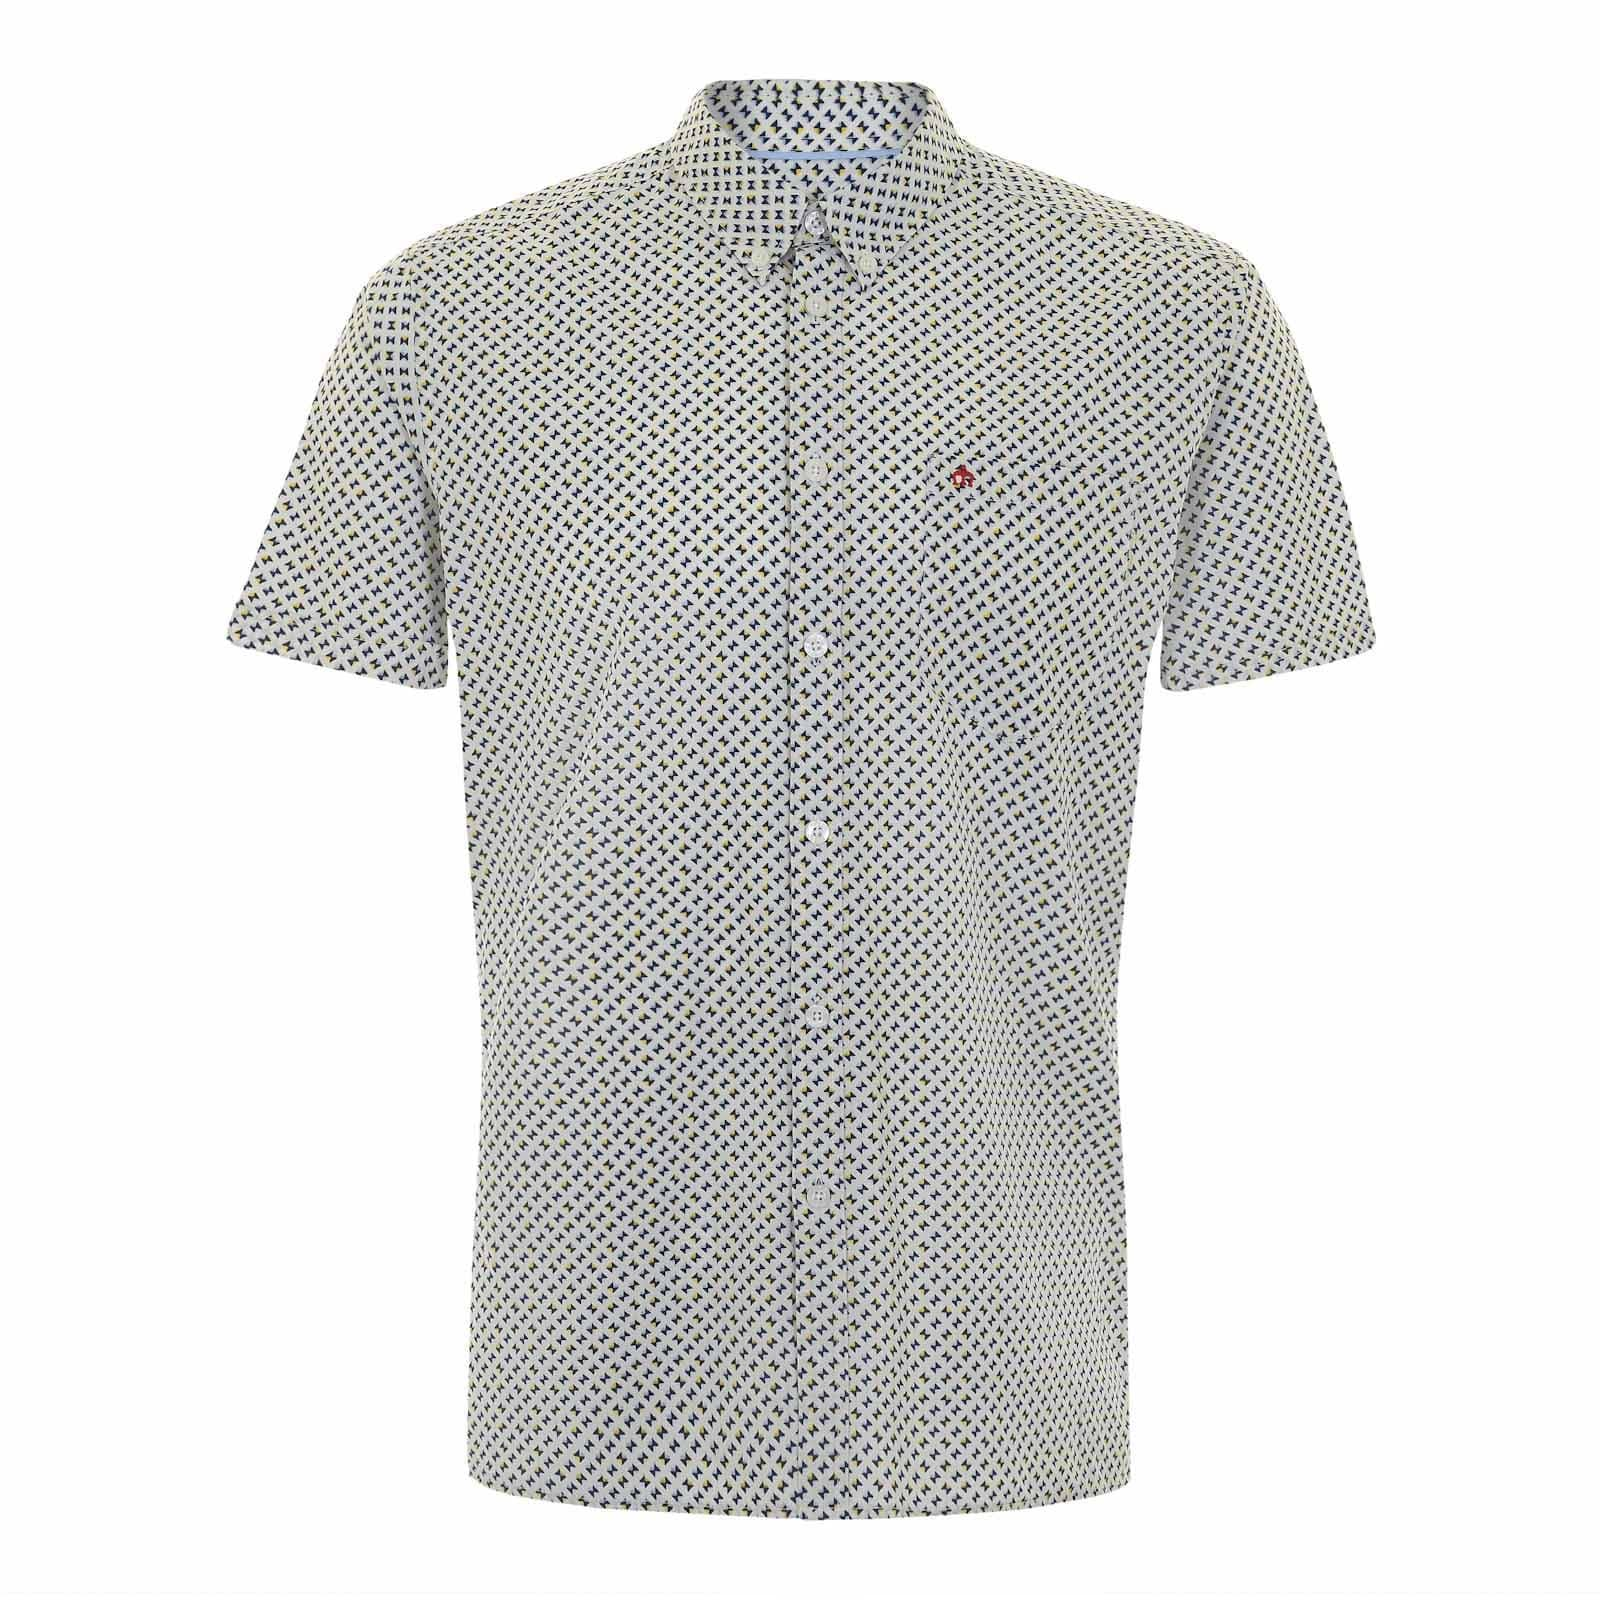 Рубашка MissonРубашки<br><br><br>Артикул: 1515102<br>Материал: 100% хлопок<br>Цвет: молочный<br>Пол: Мужской